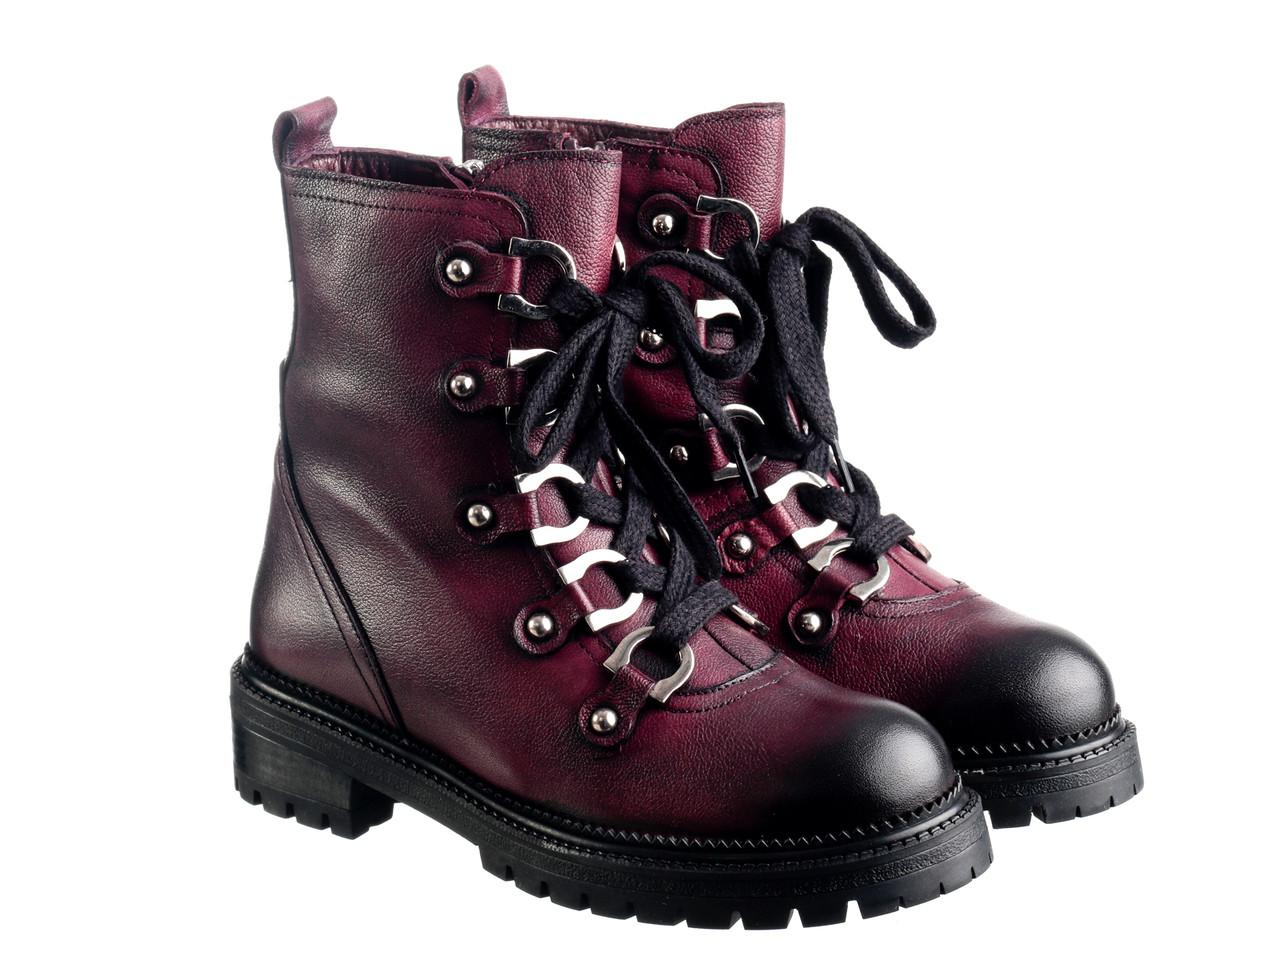 Ботинки Etor 7017-7495-604 бордо